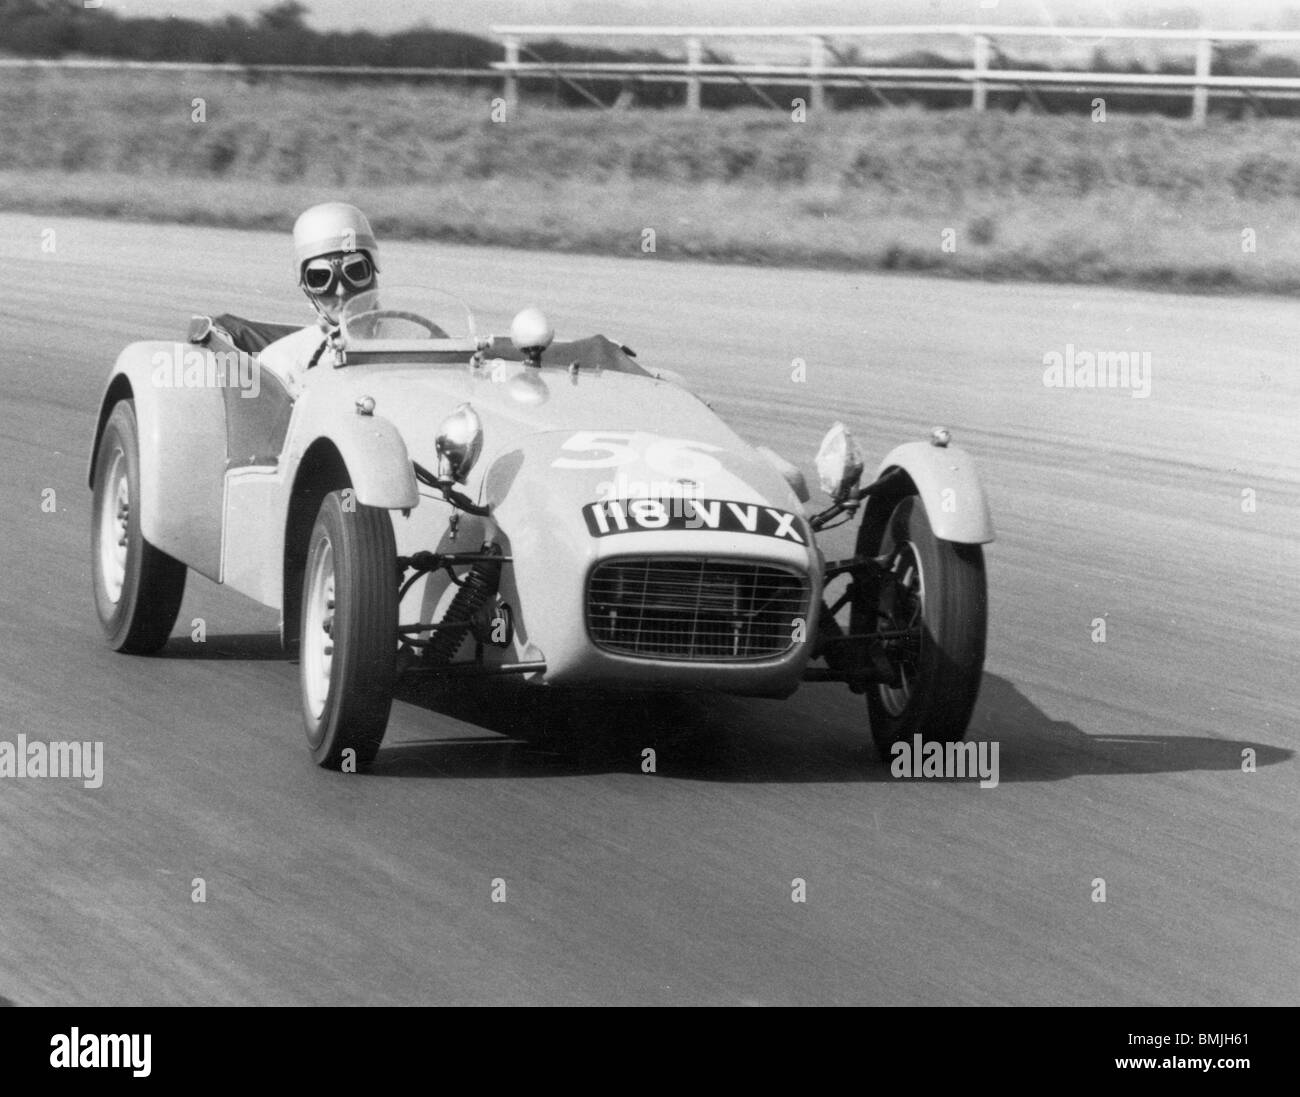 Lotus Seven at silverstone 1961 - Stock Image